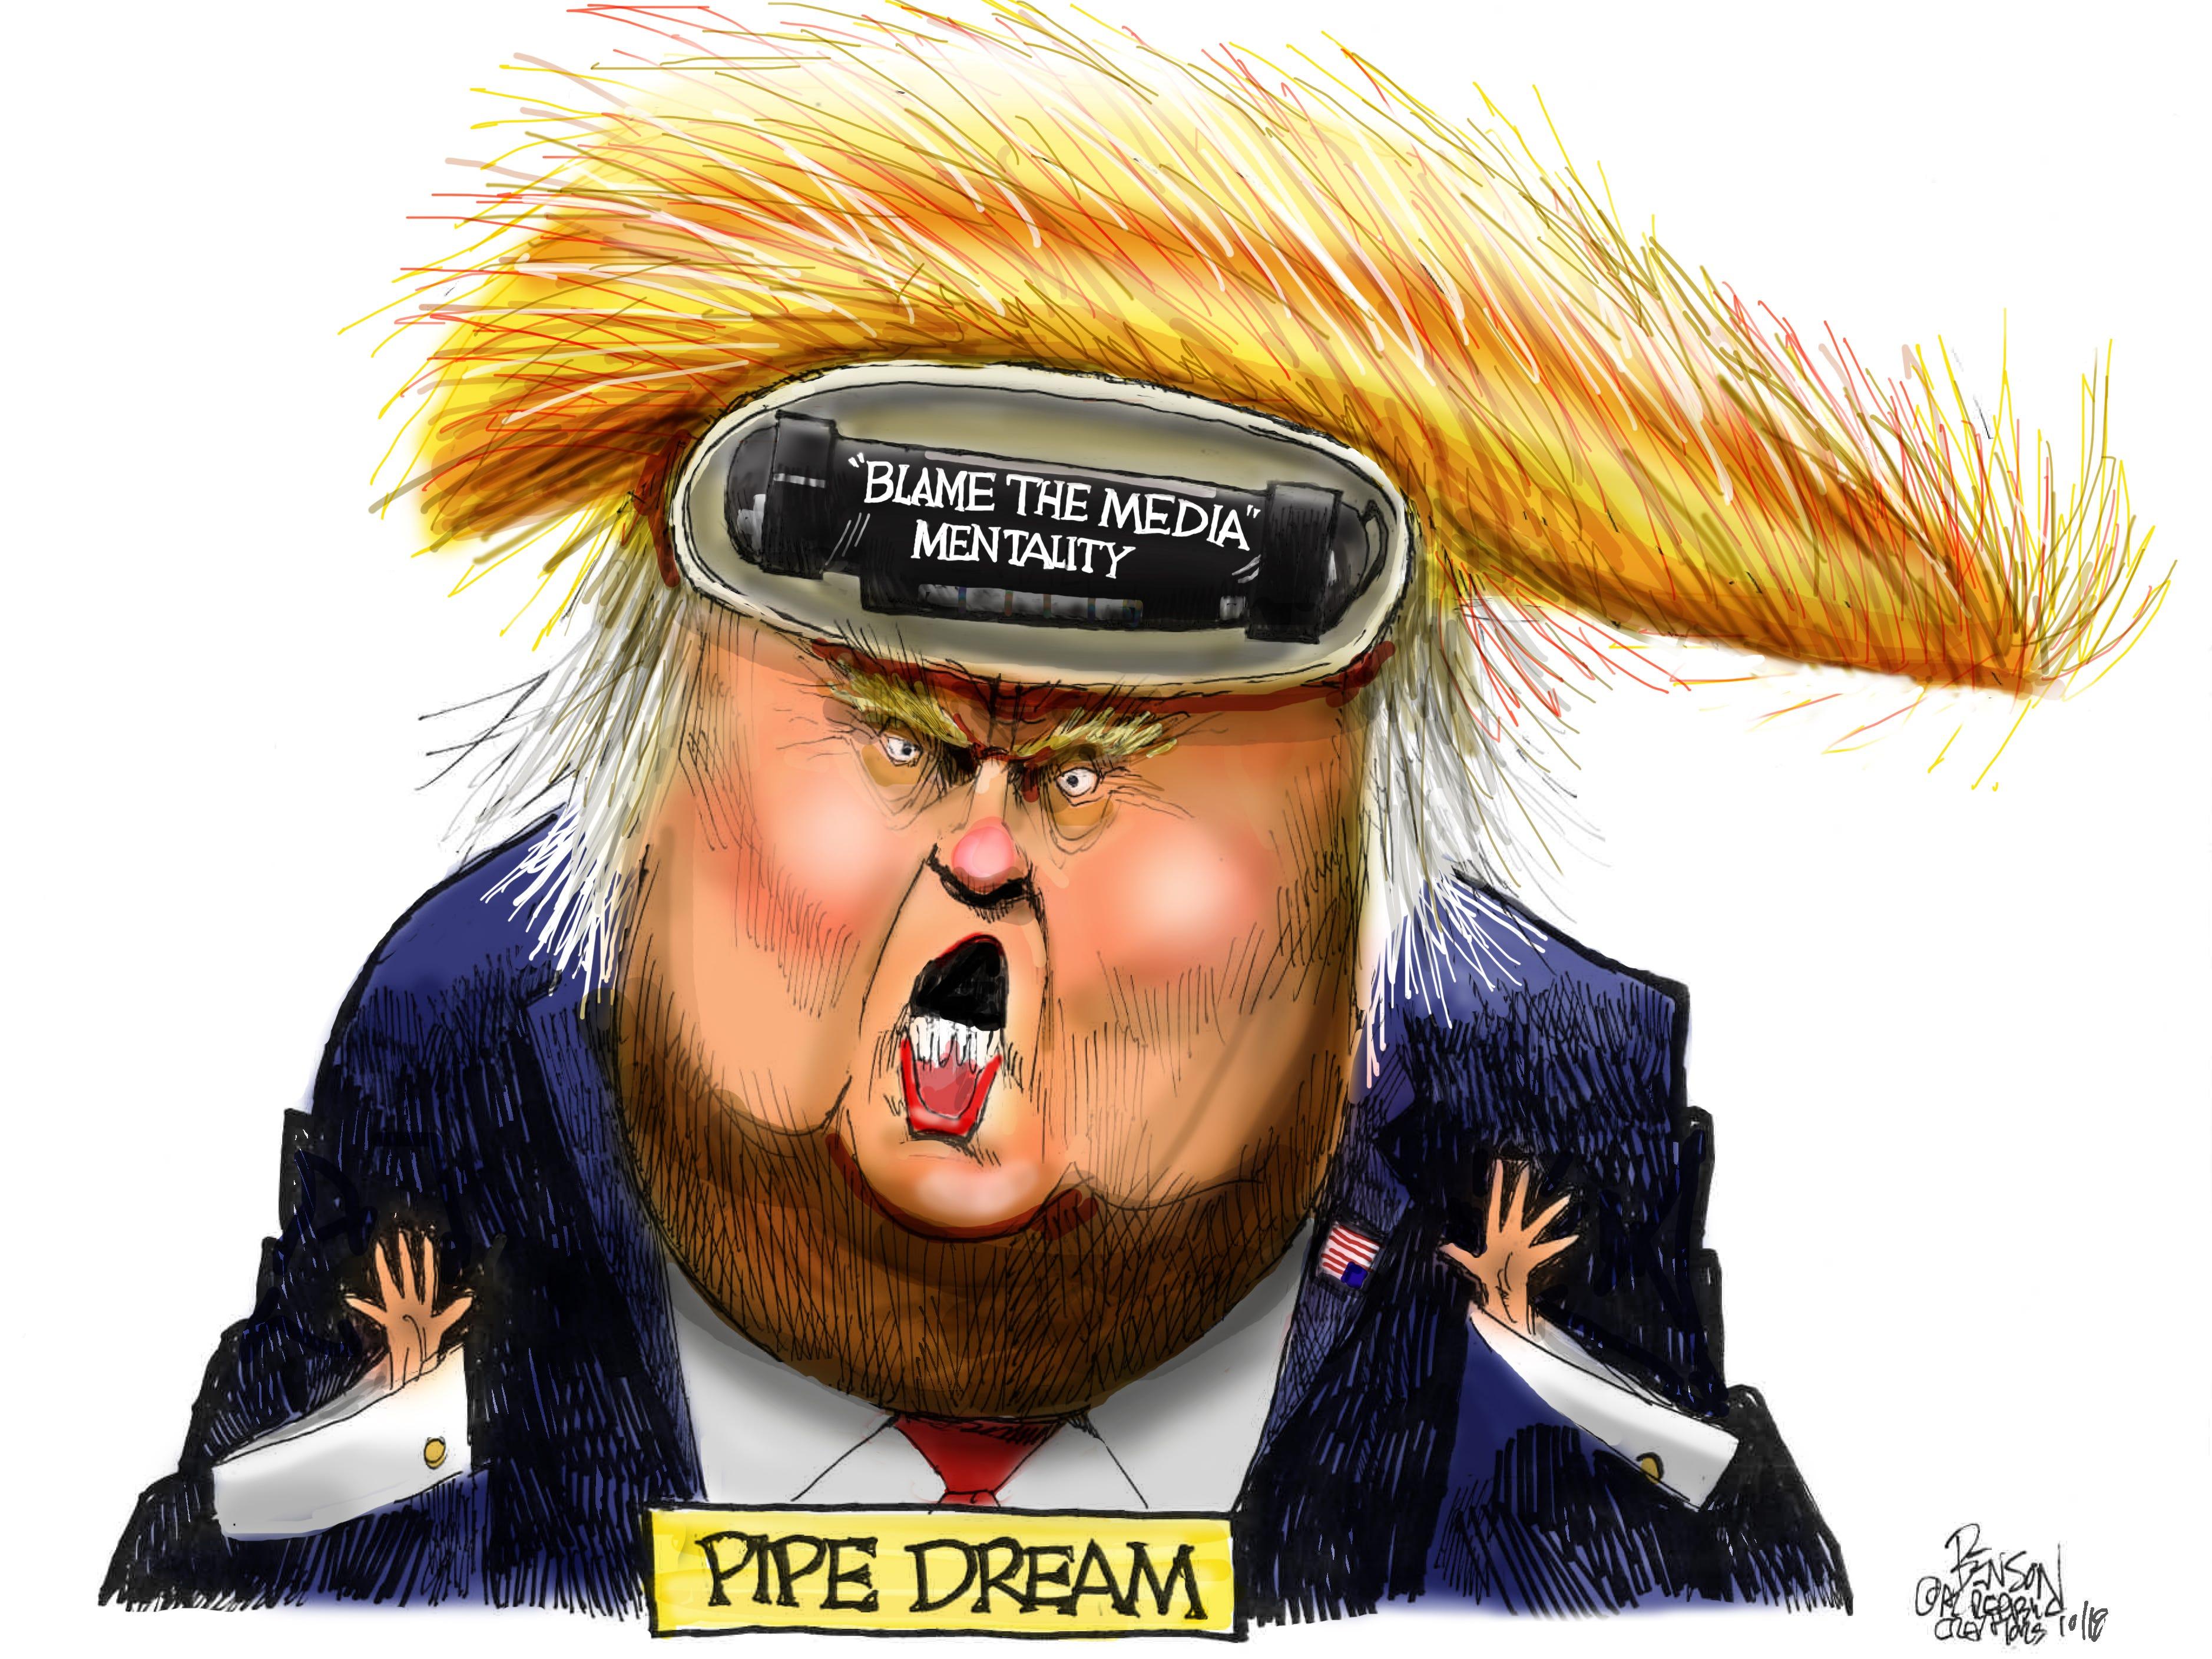 Cartoon for Oct. 26, 2018.